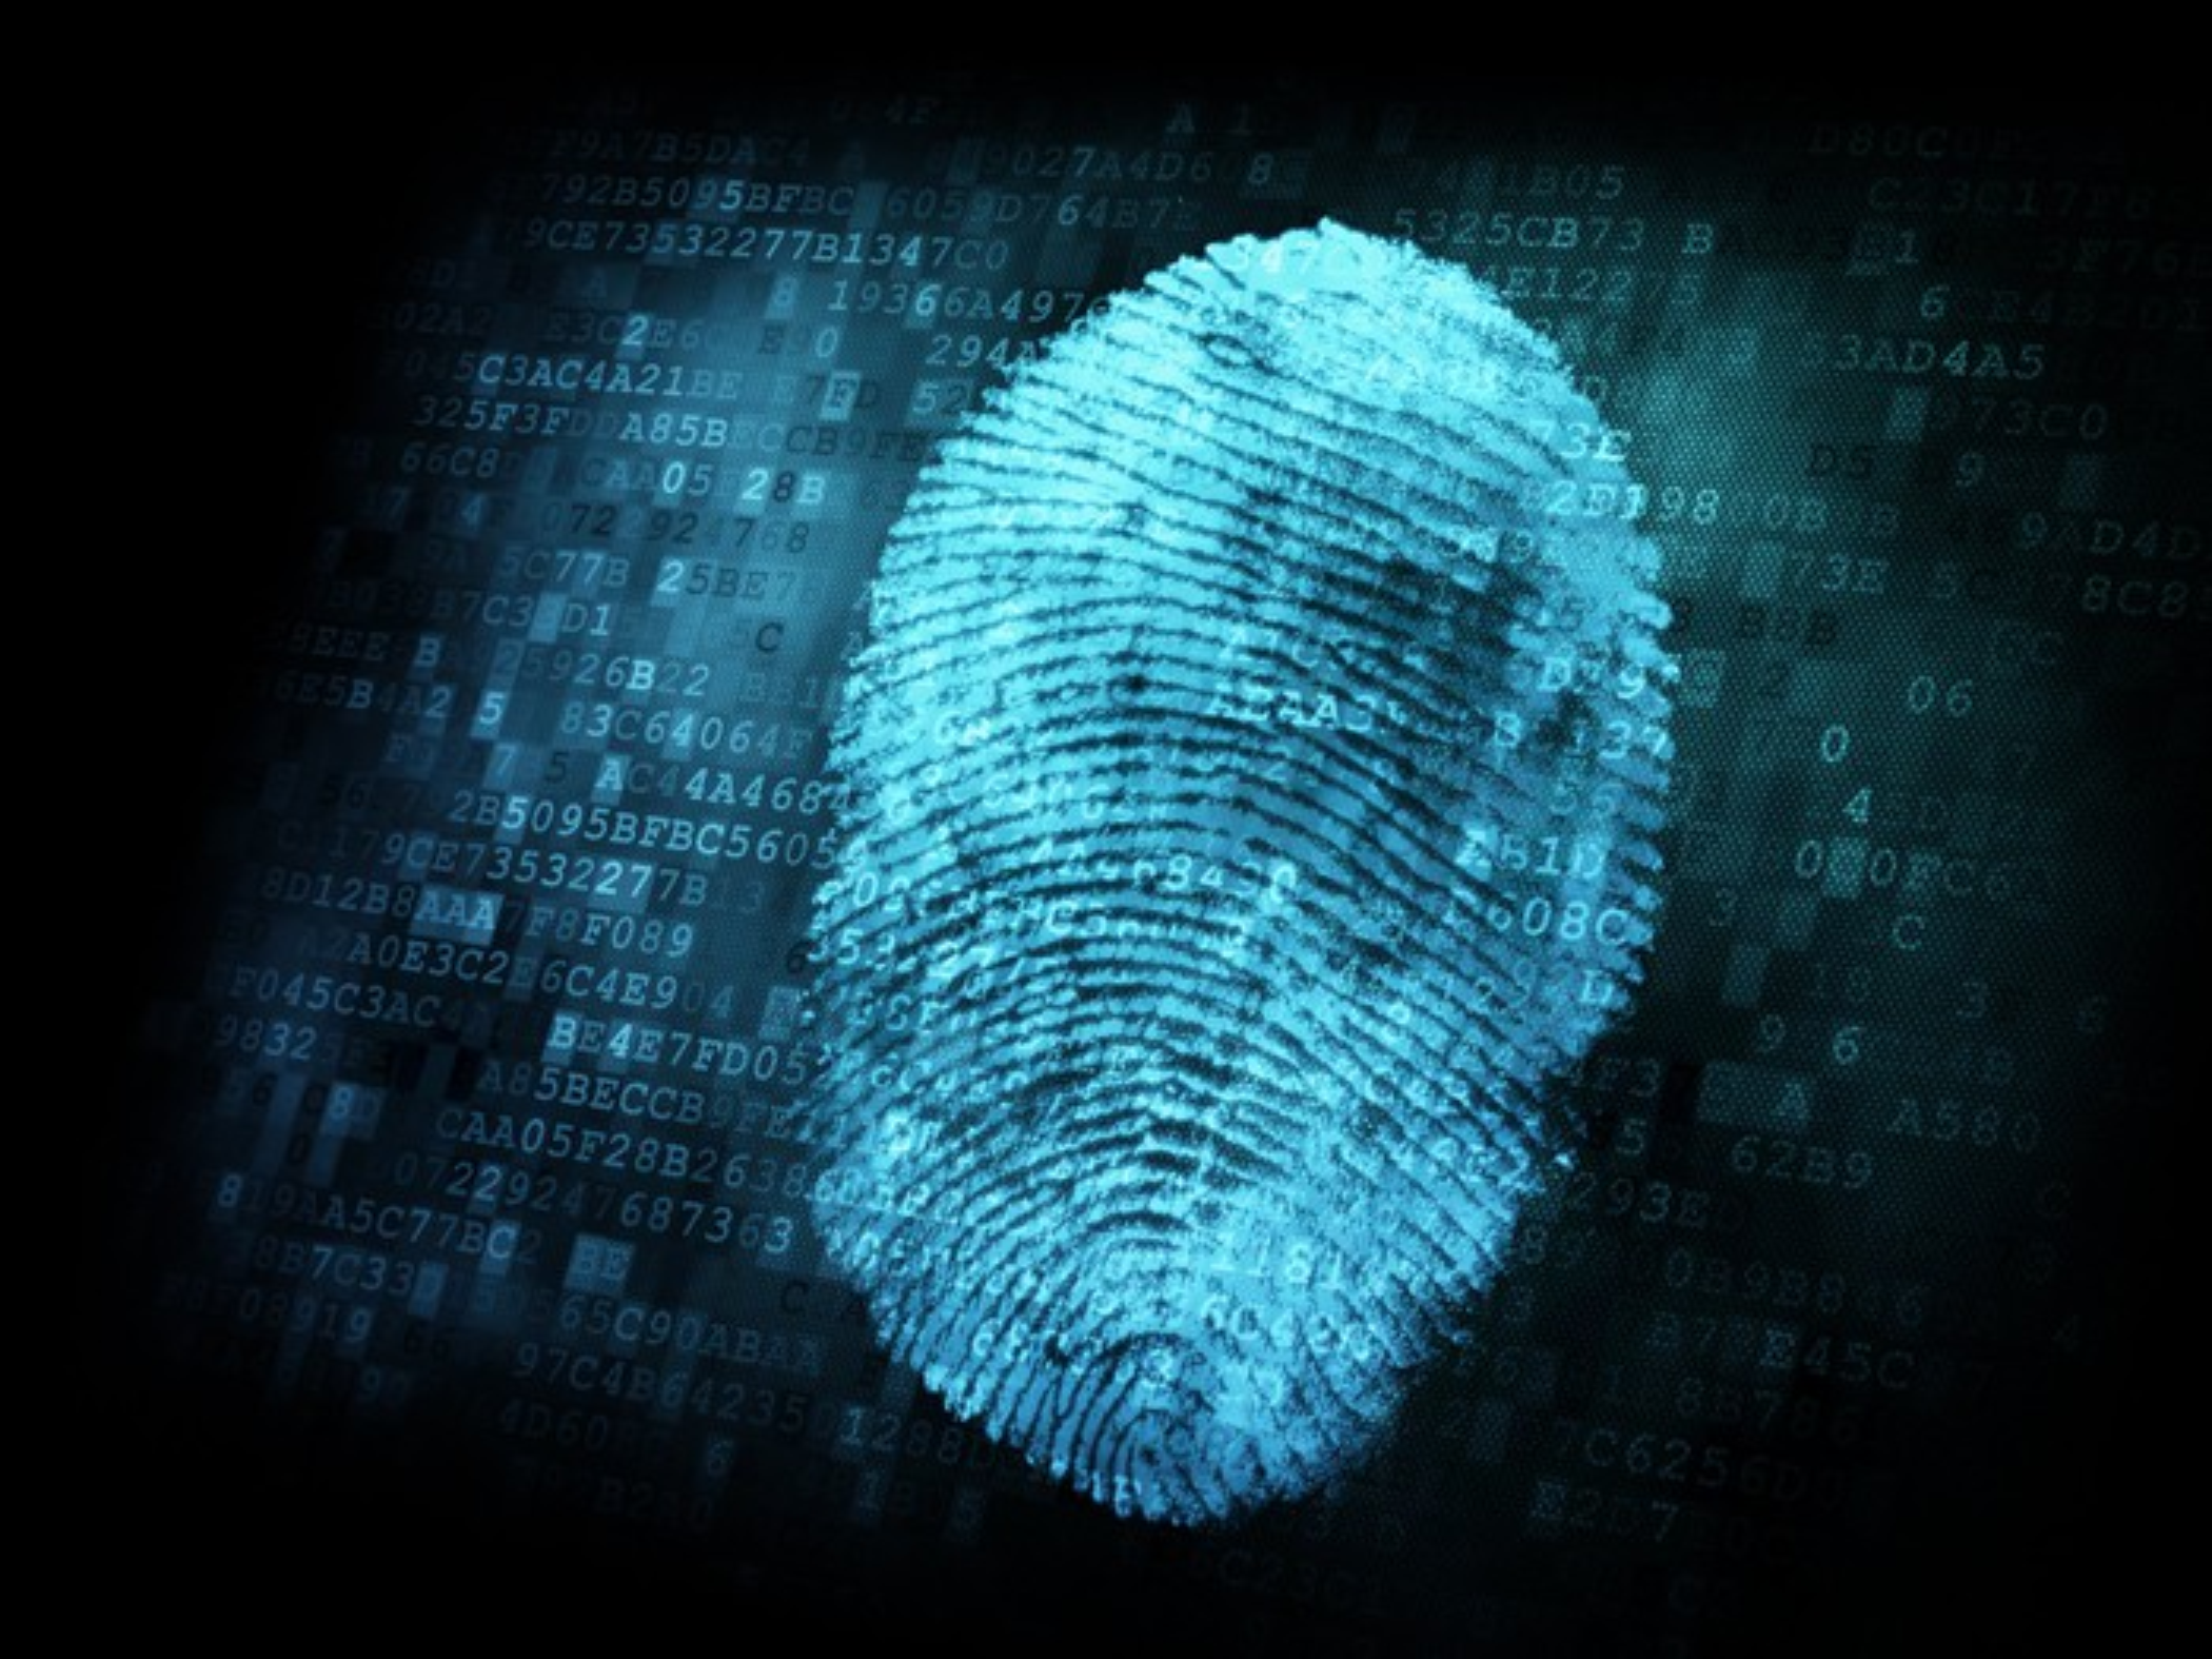 A computer graphic of a fingerprint